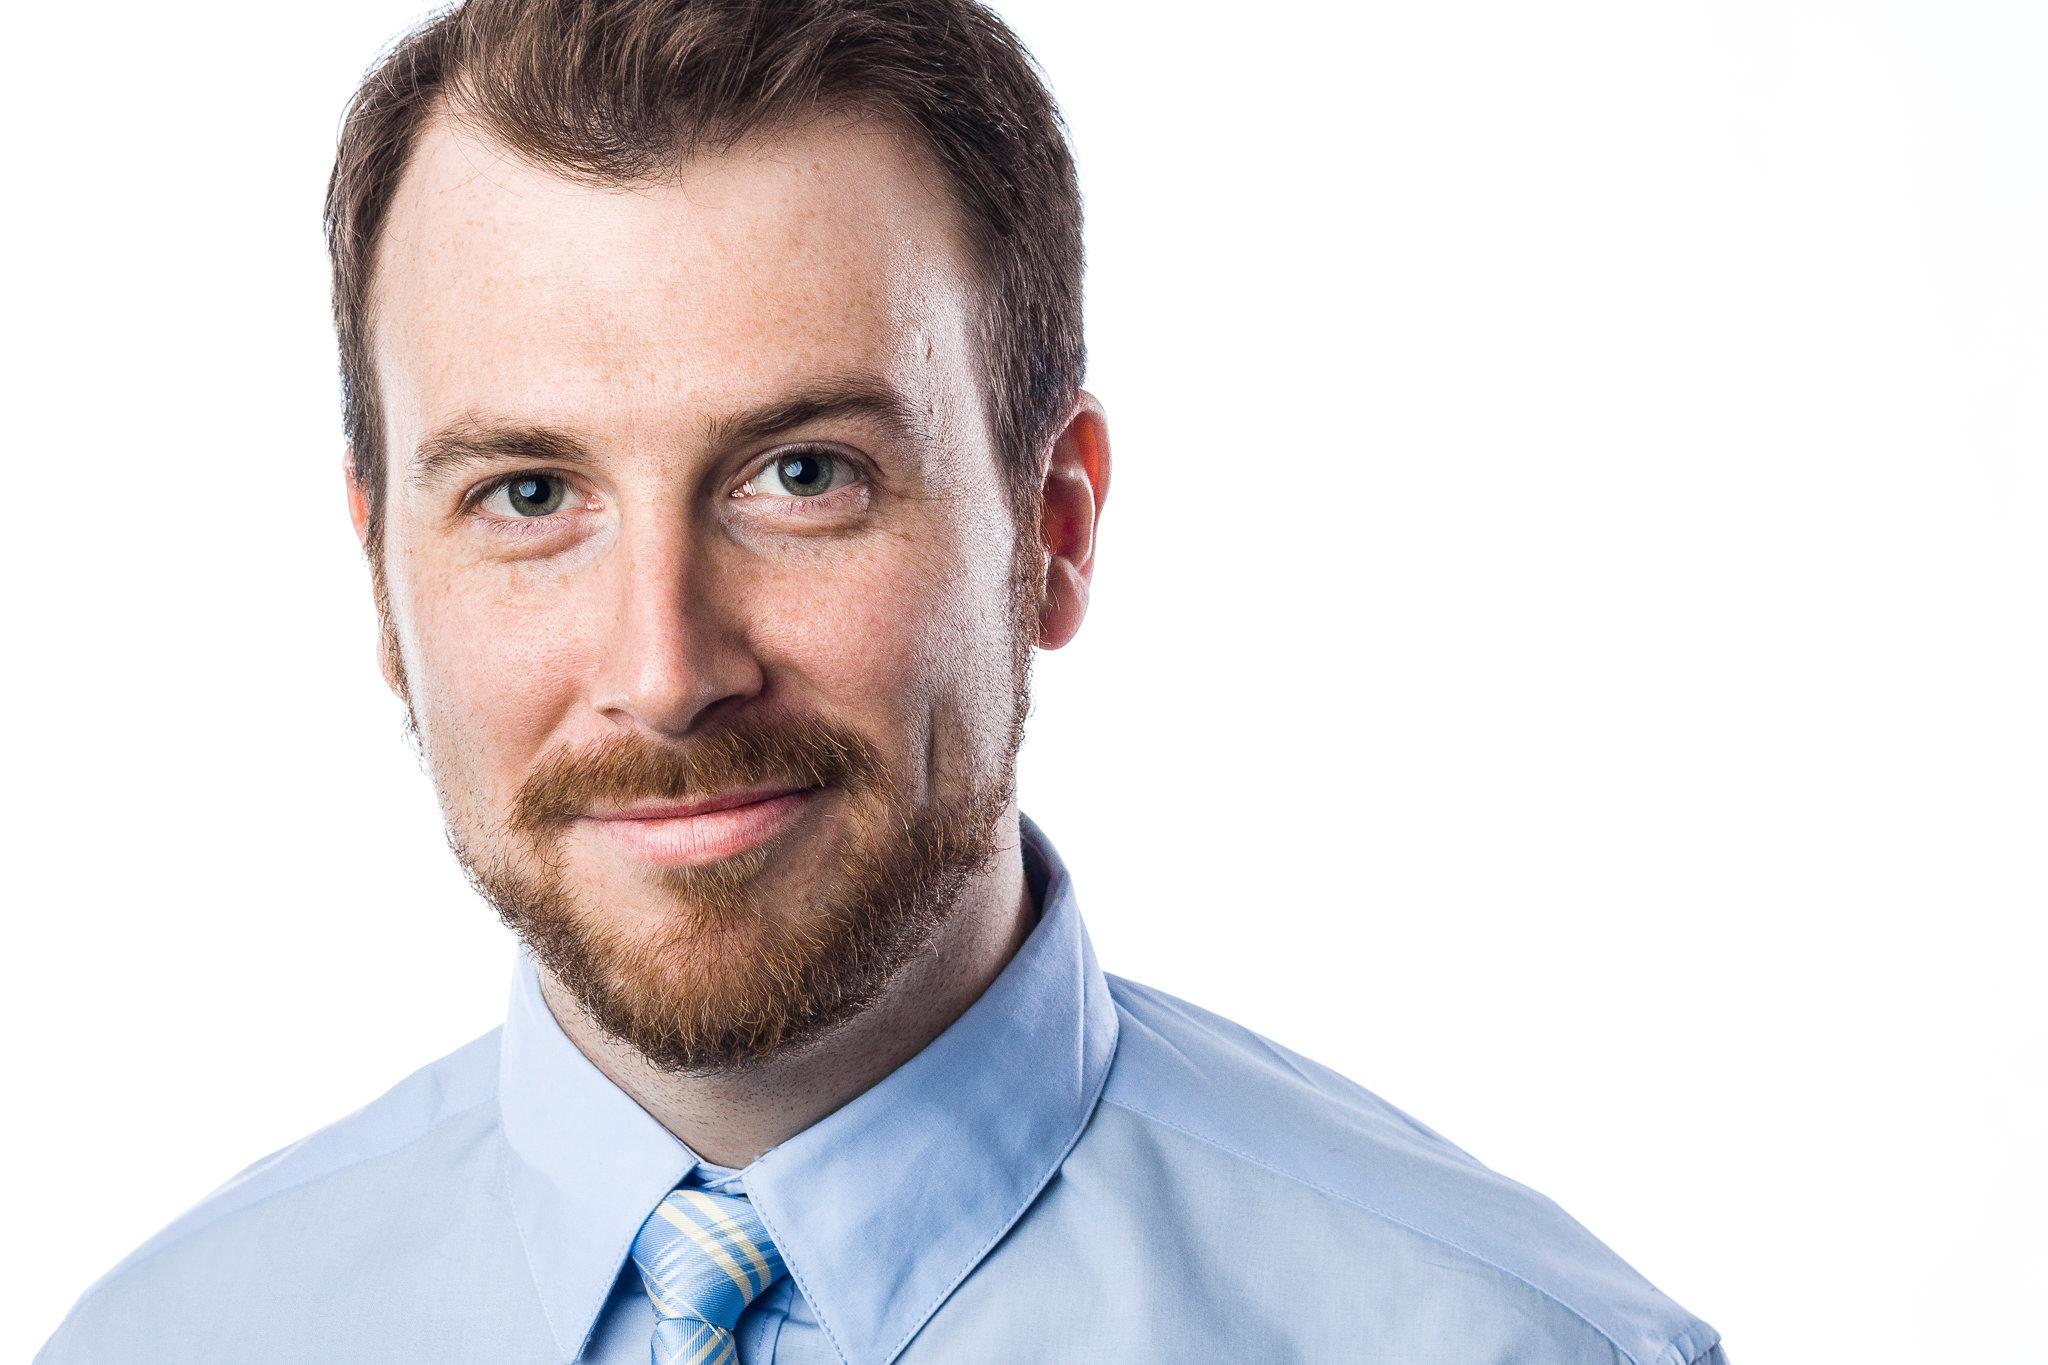 Toronto professional headshot of businessman.